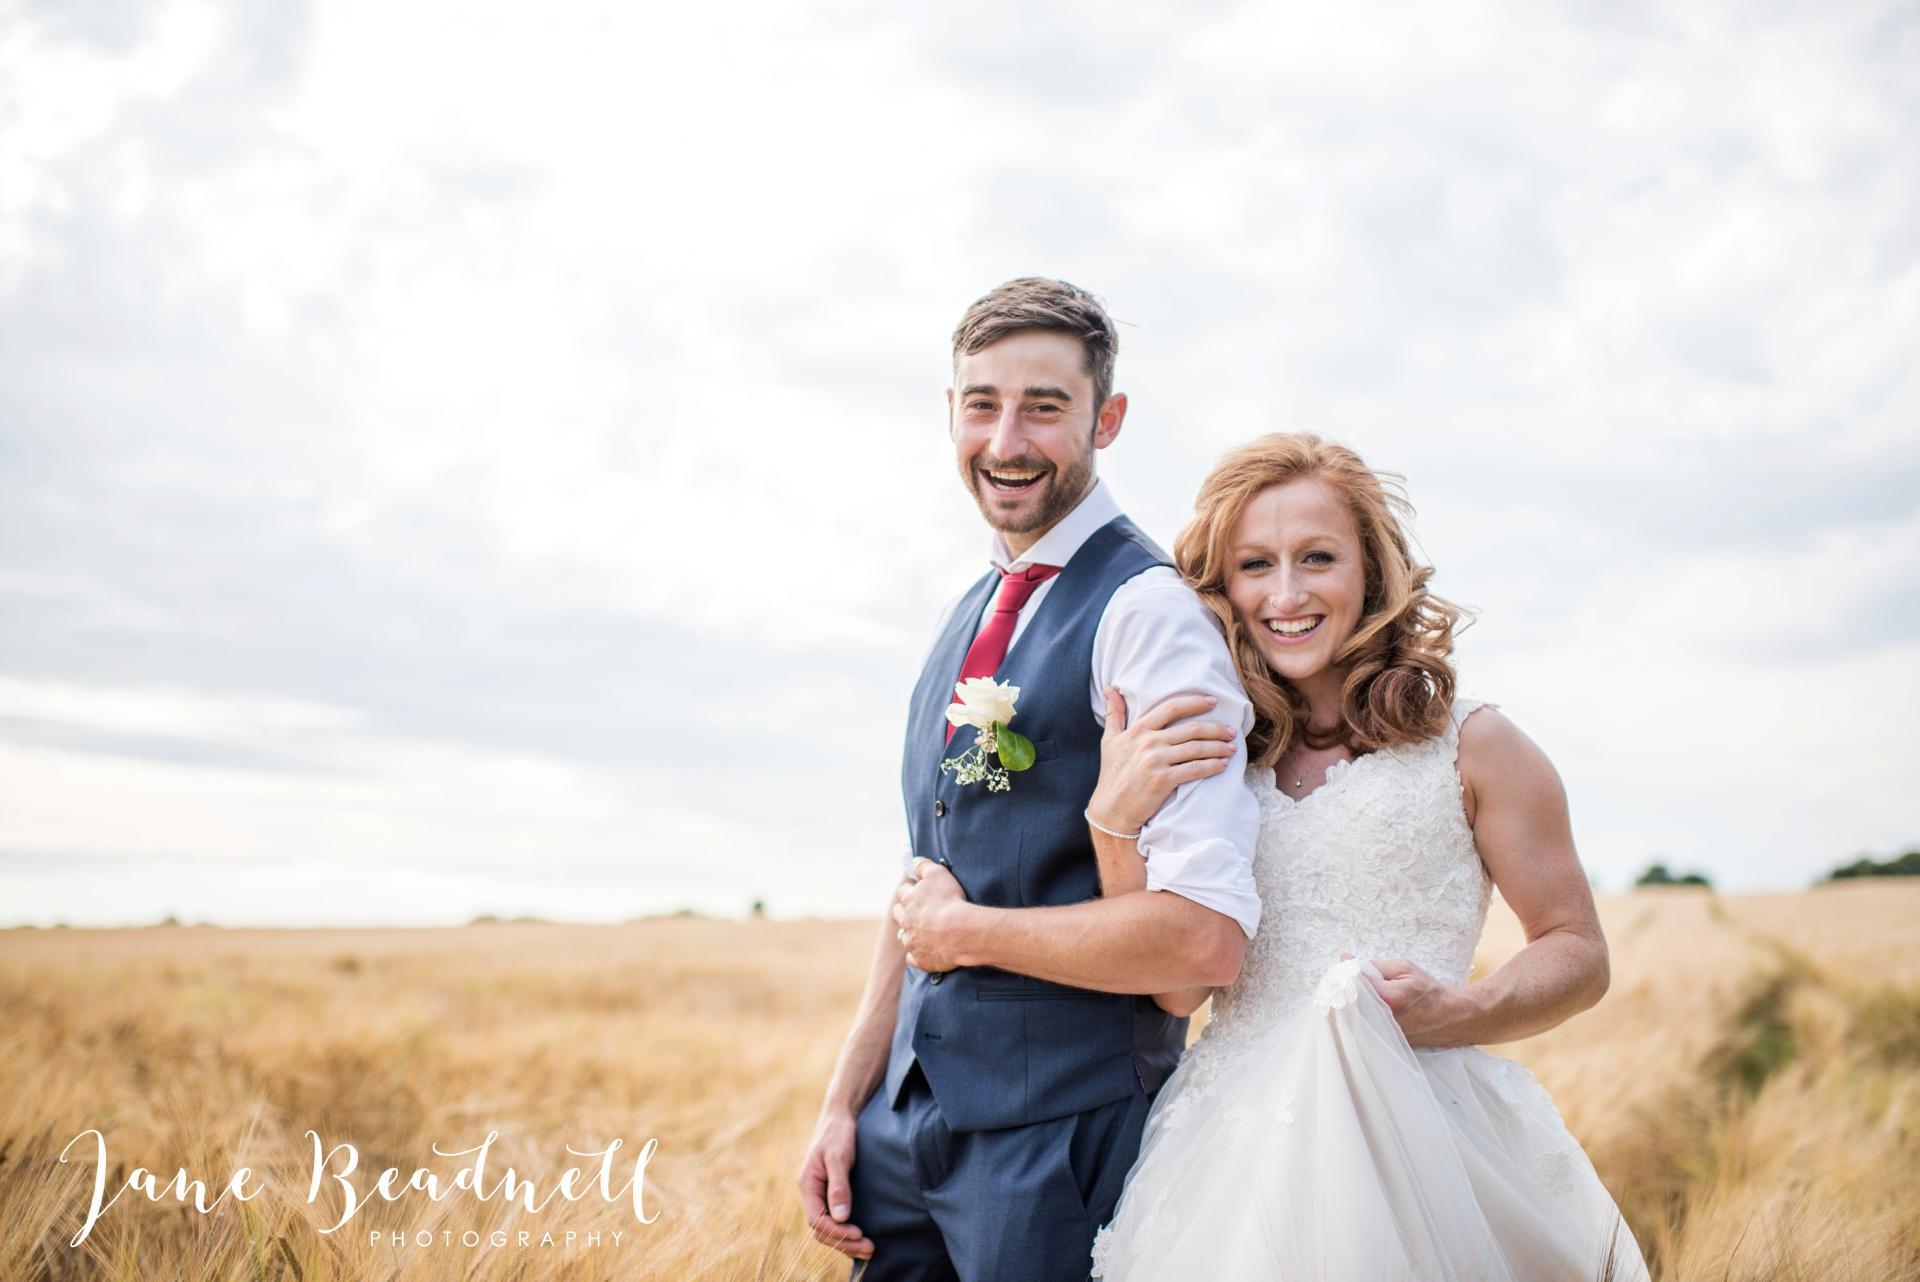 yorkshire-fine-art-wedding-photographer-jane-beadnell-photography-poppleton-york_0145